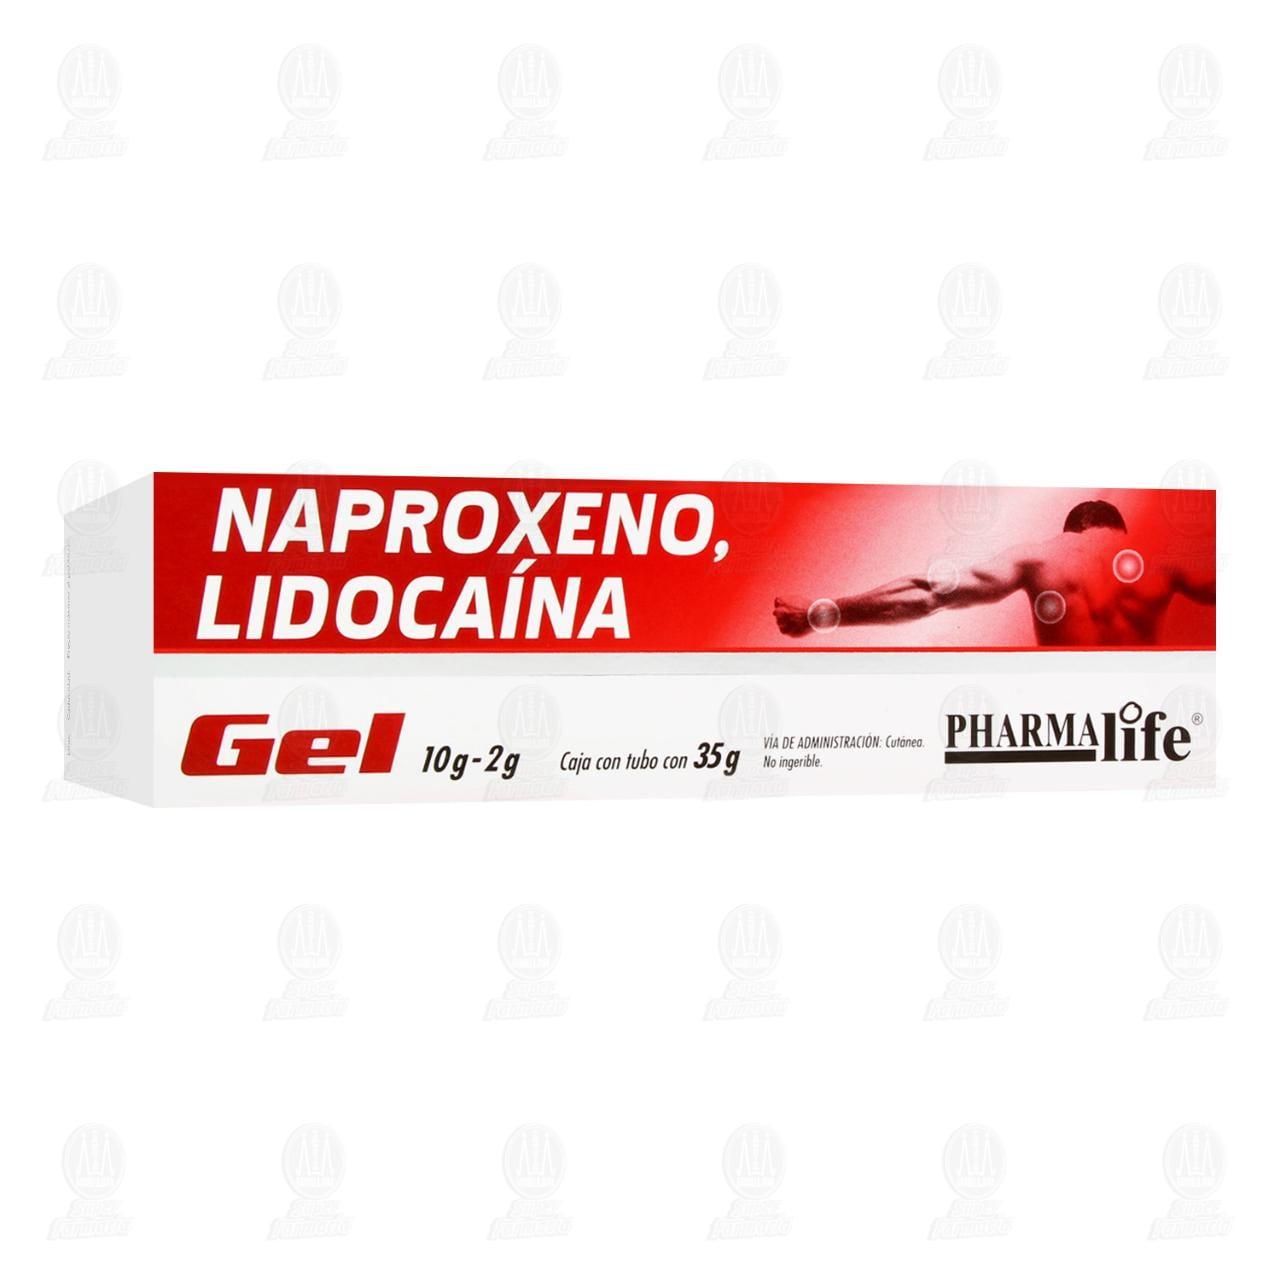 Comprar Naproxeno Lidocaína 10/2g 35gr Gel Pharmalife en Farmacias Guadalajara